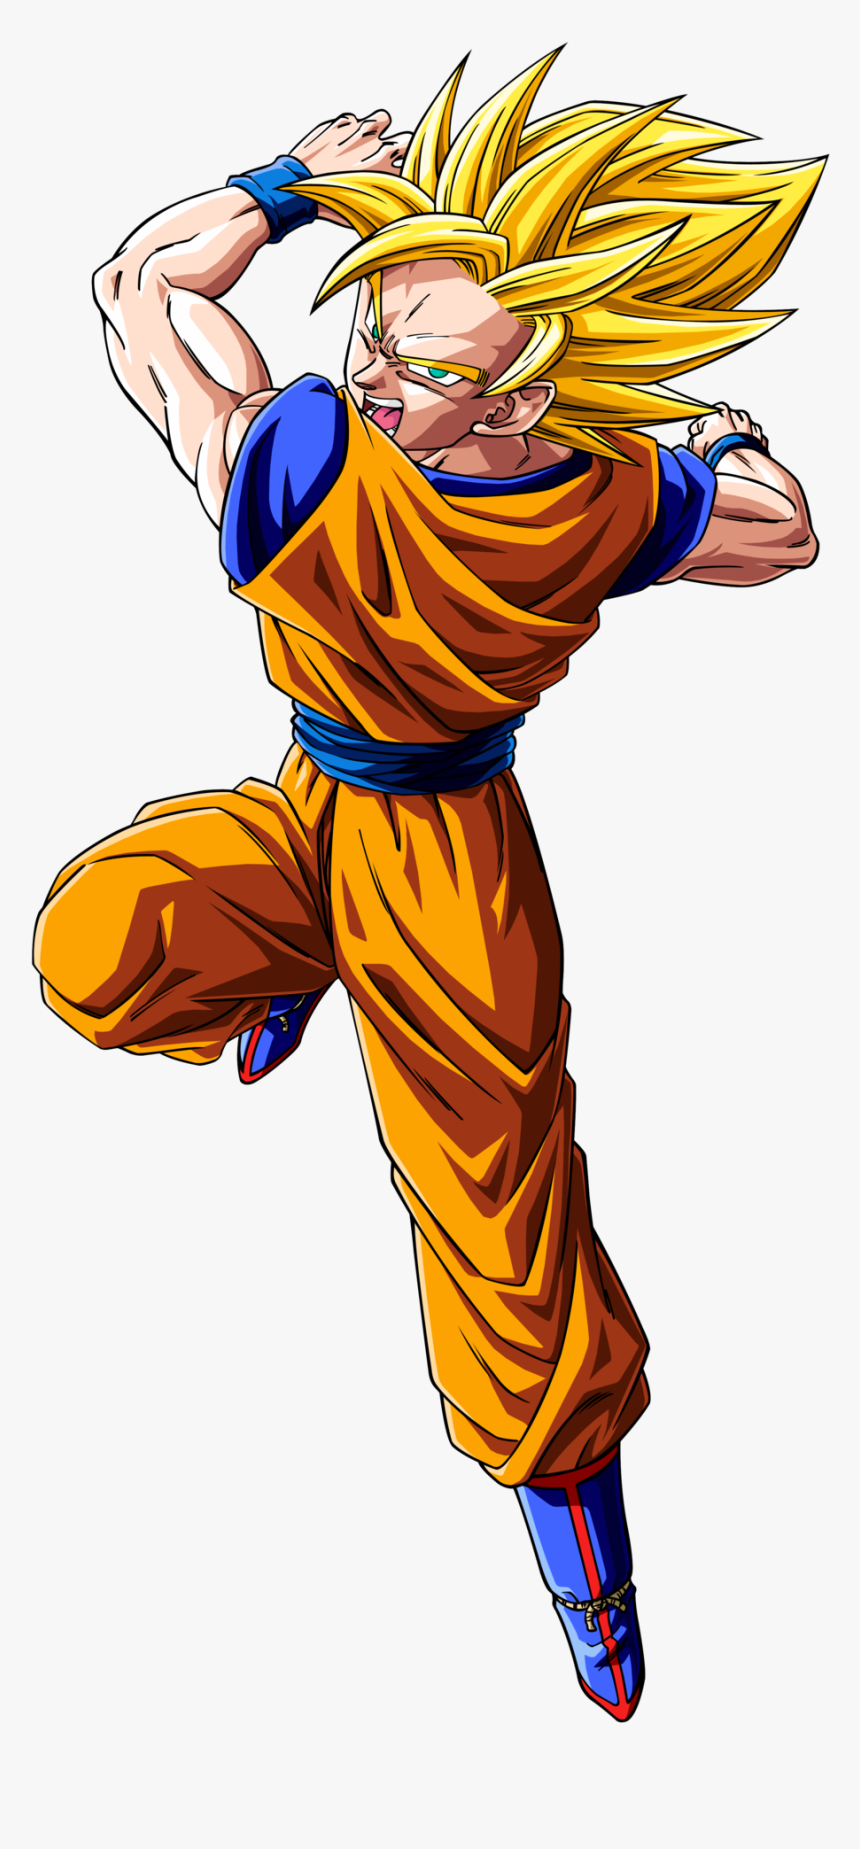 Dragon Ball Z Goku Transparent Image - Dragon Ball Super Goku Ssj, HD Png Download, Free Download